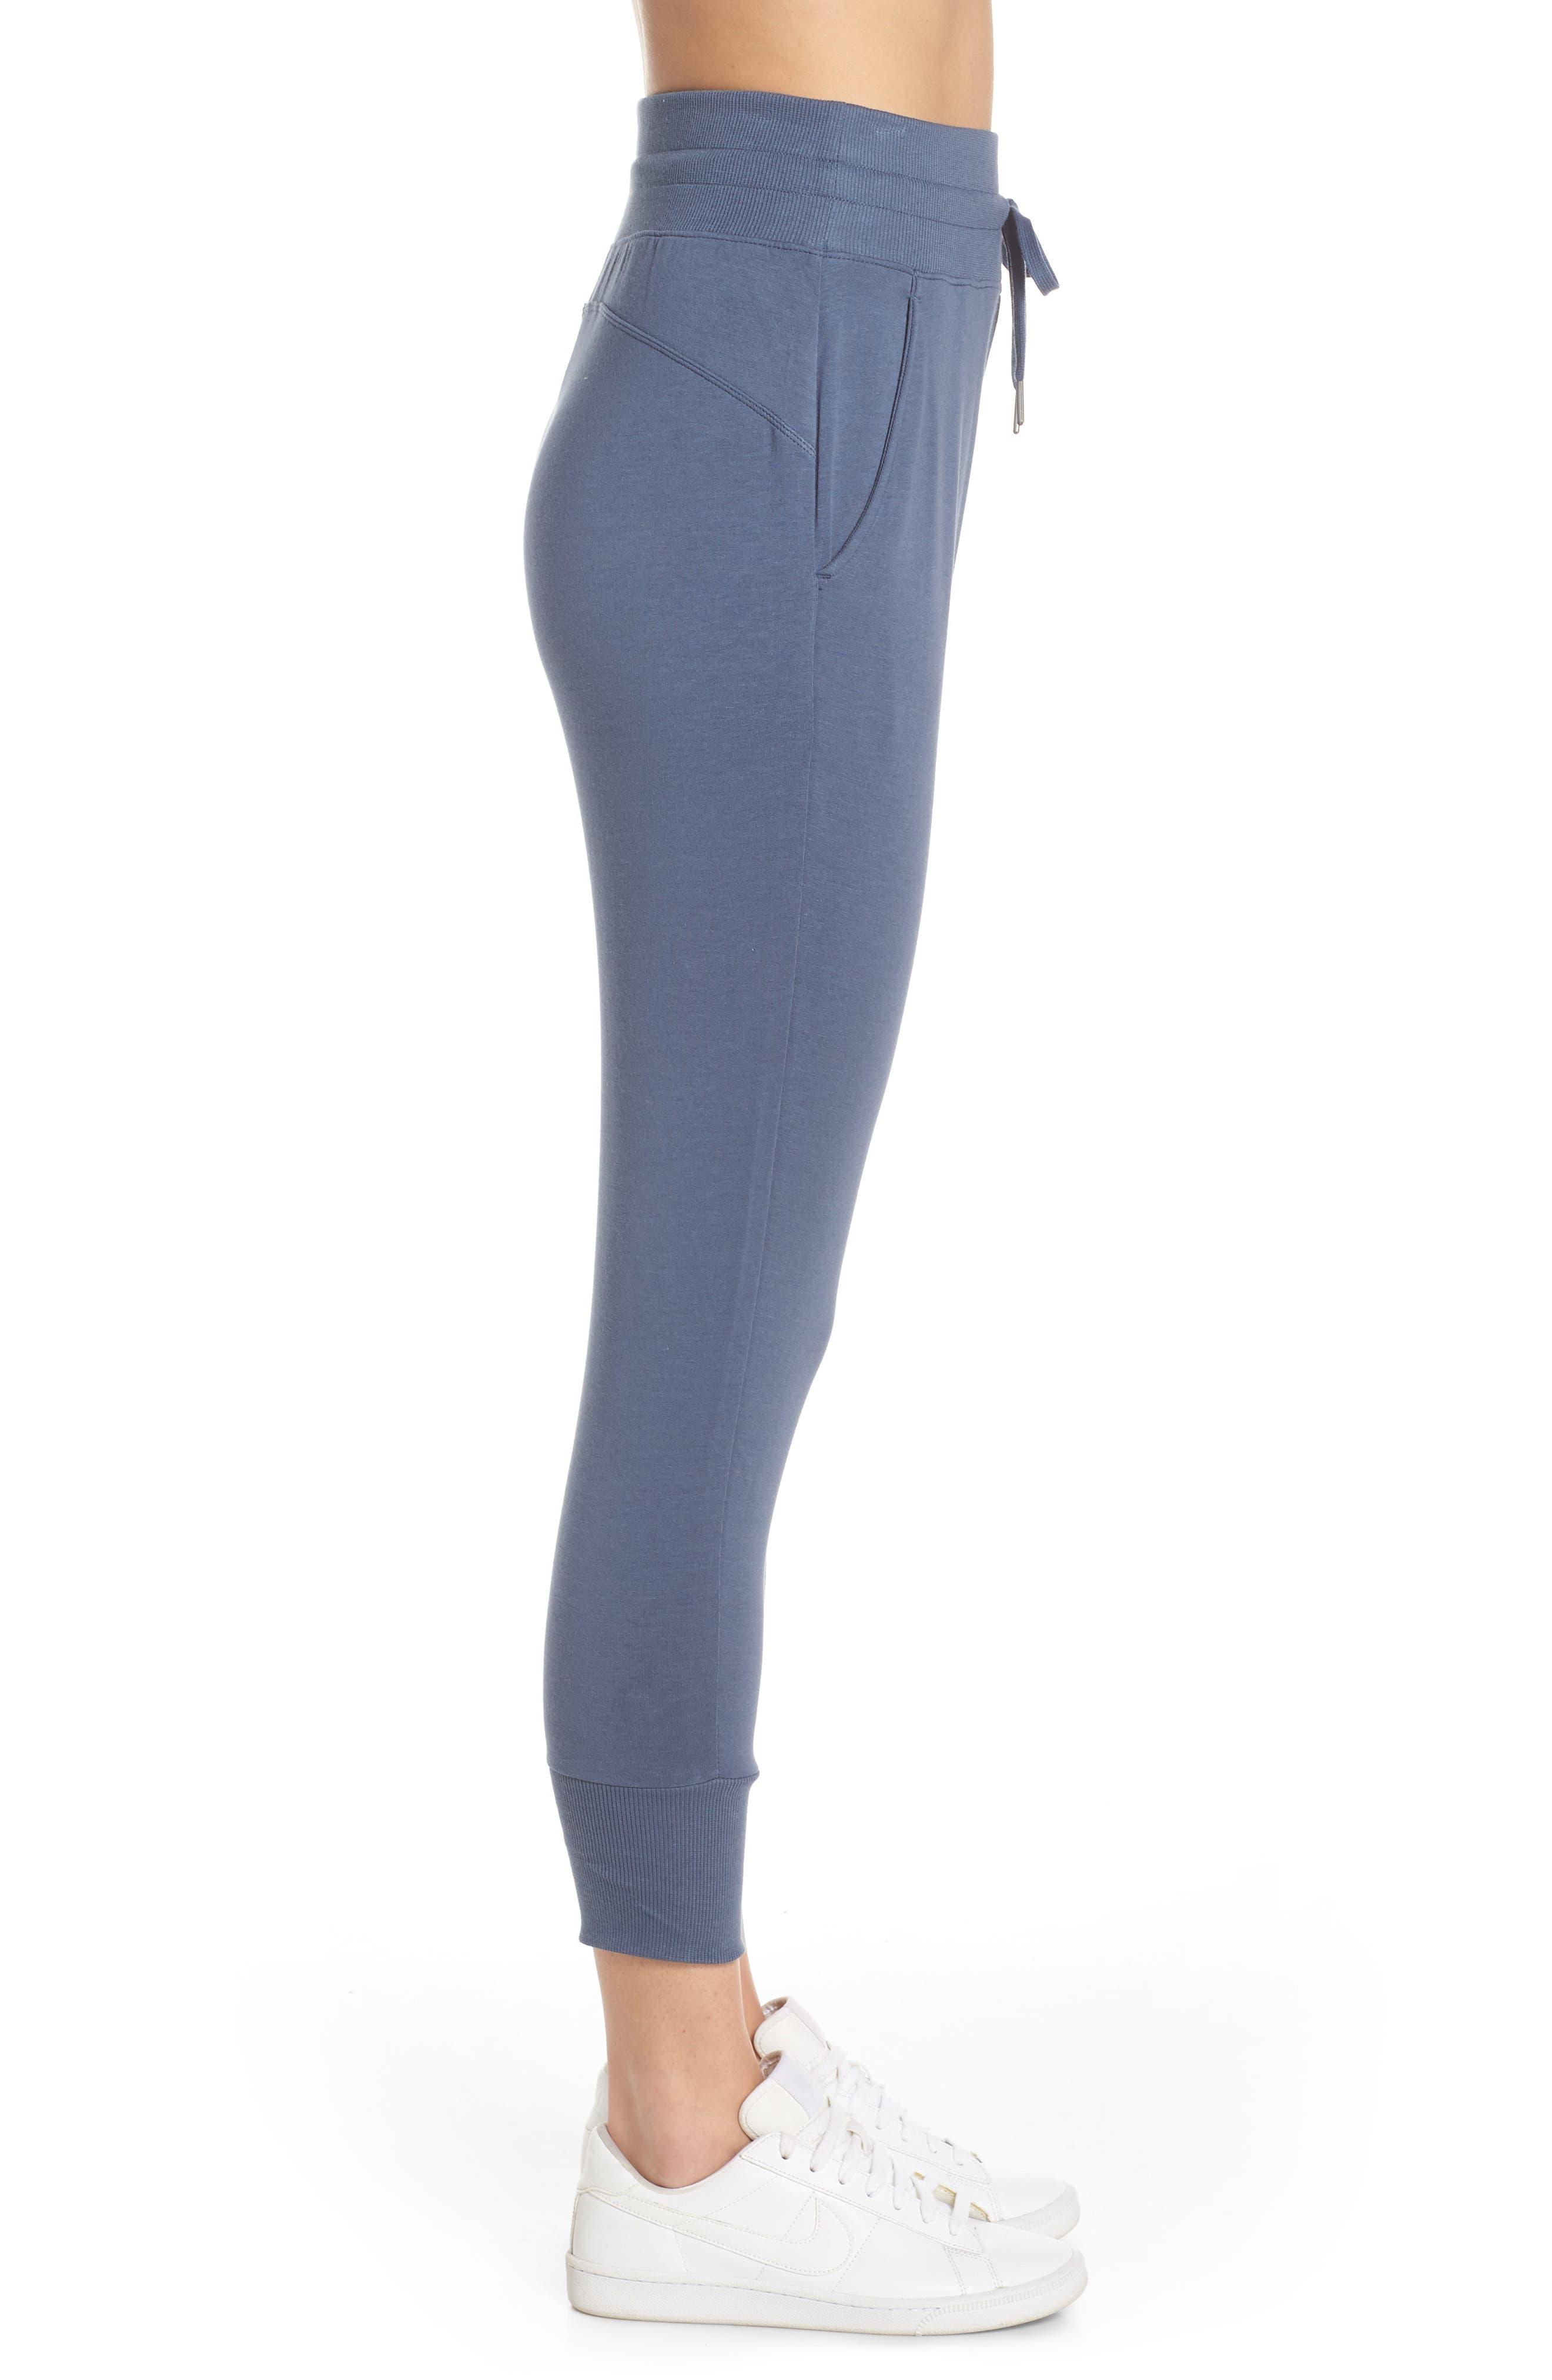 ZELLA, Repeat High Waist Crop Jogger Pants, Alternate thumbnail 4, color, BLUE VINTAGE